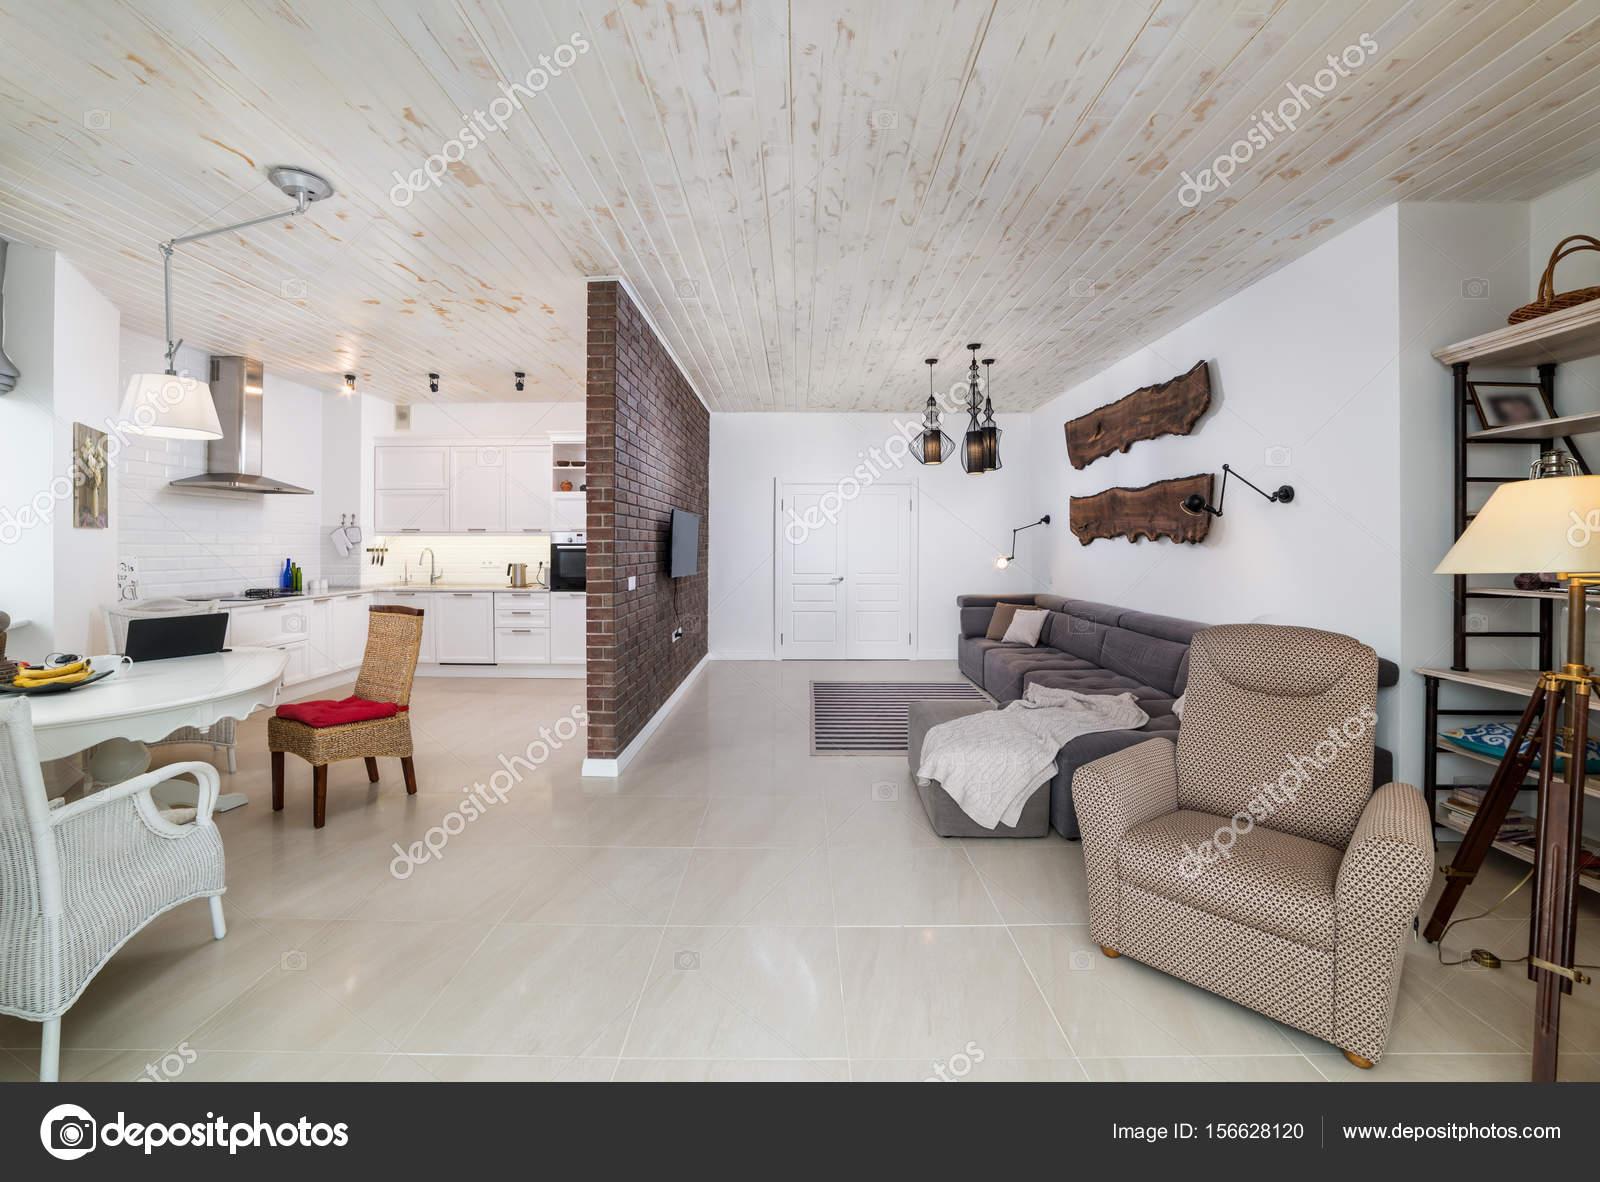 https://st3.depositphotos.com/1014900/15662/i/1600/depositphotos_156628120-stockafbeelding-prachtige-grote-woonkamer-interieur.jpg